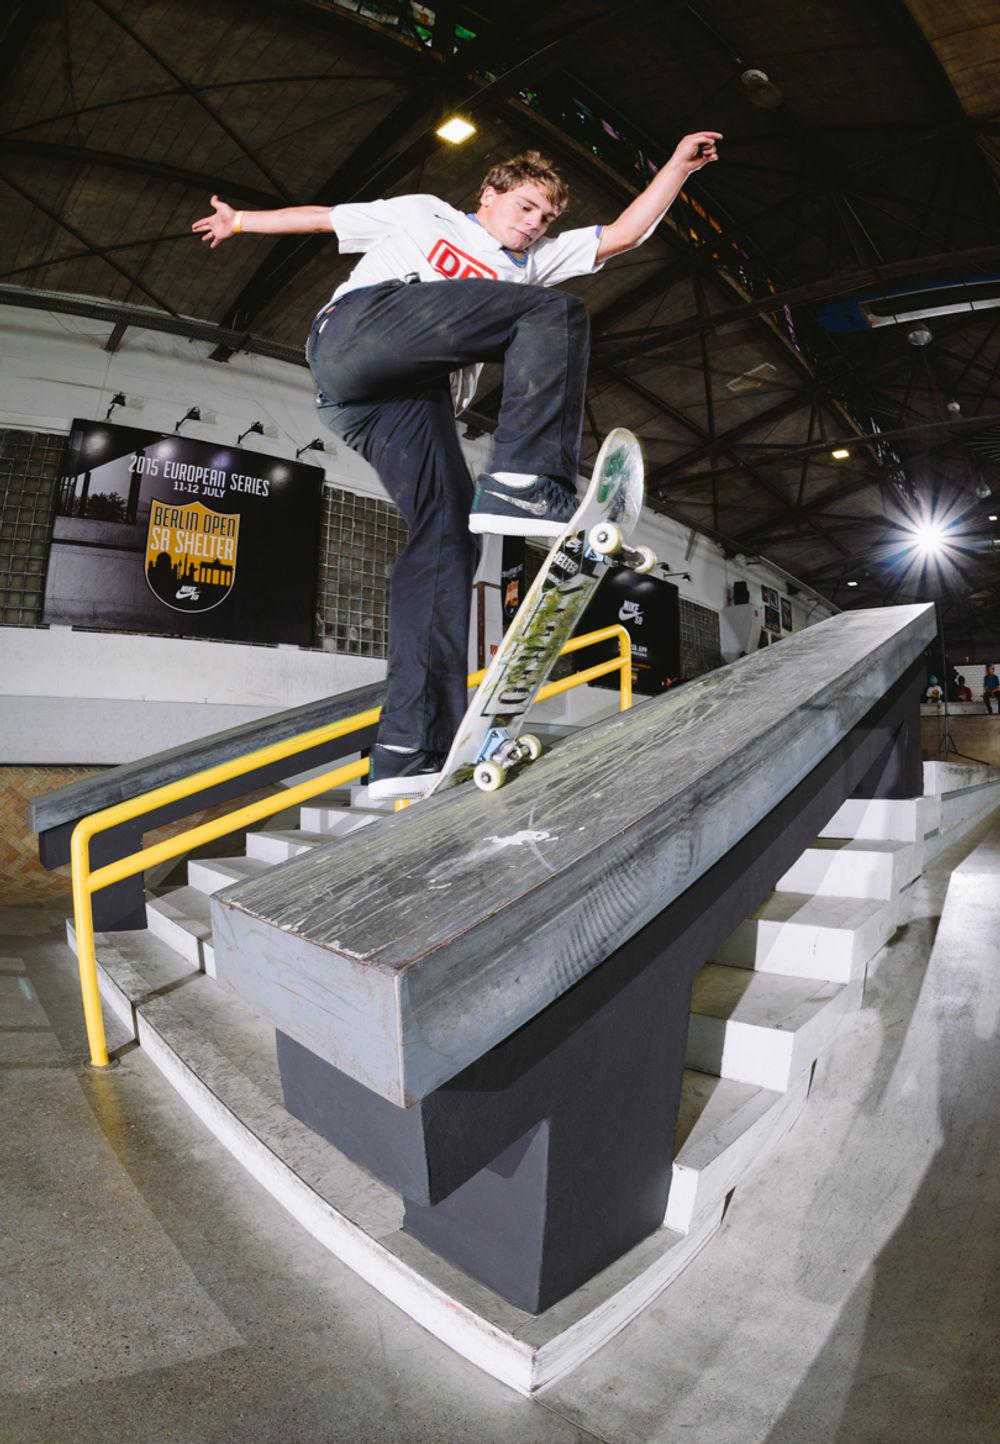 _IHC0990-Yoshi-Tanenbaum-Fs-Blunt-Nike-SB-Berlin-Open-Day-1-July-2015-Photographer-Maksim-Kalanep